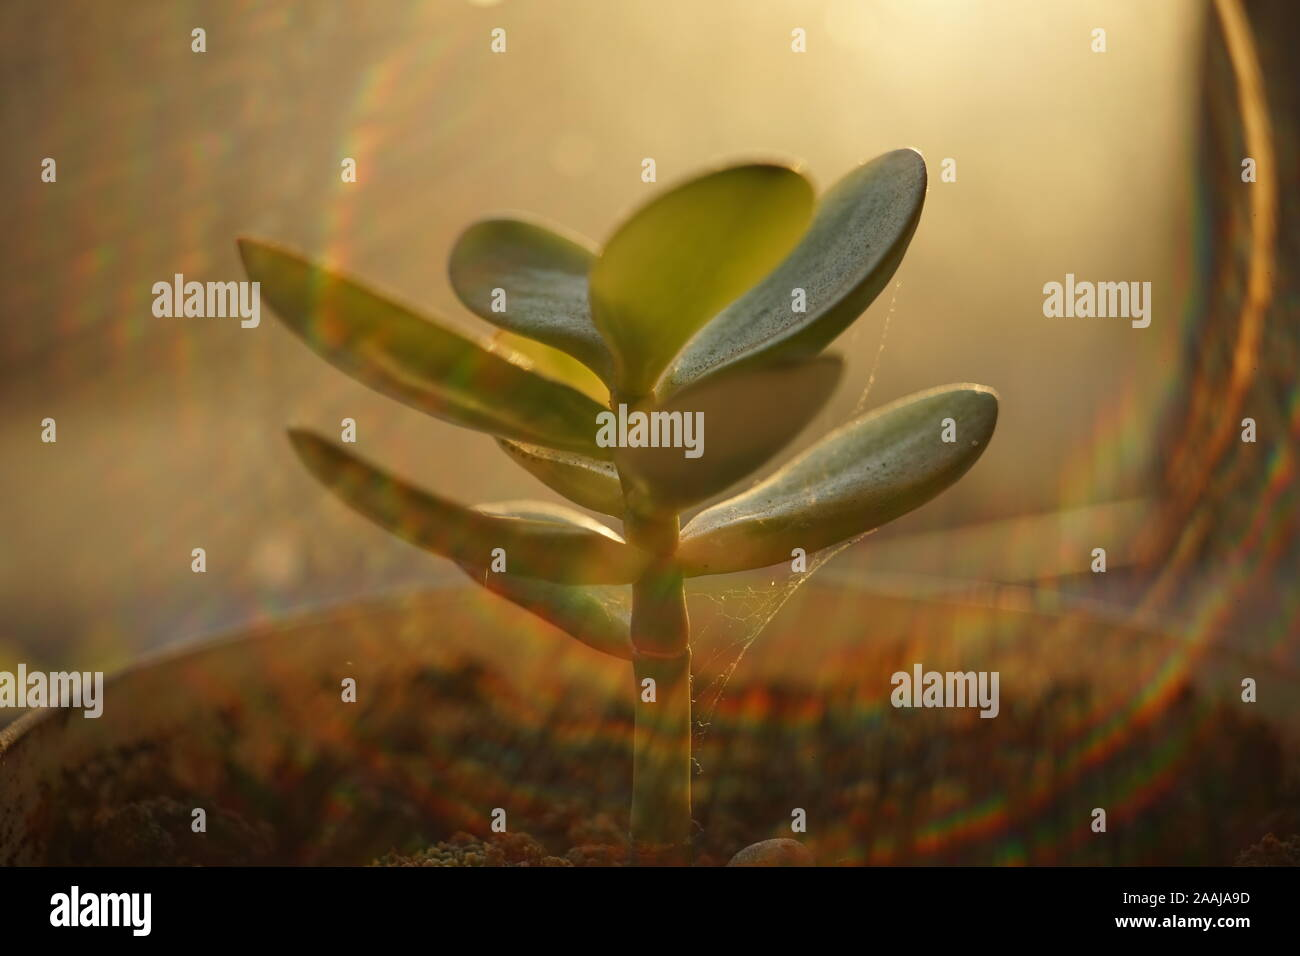 Giovane germoglio money tree. Crassula flower closeup. Foto Stock